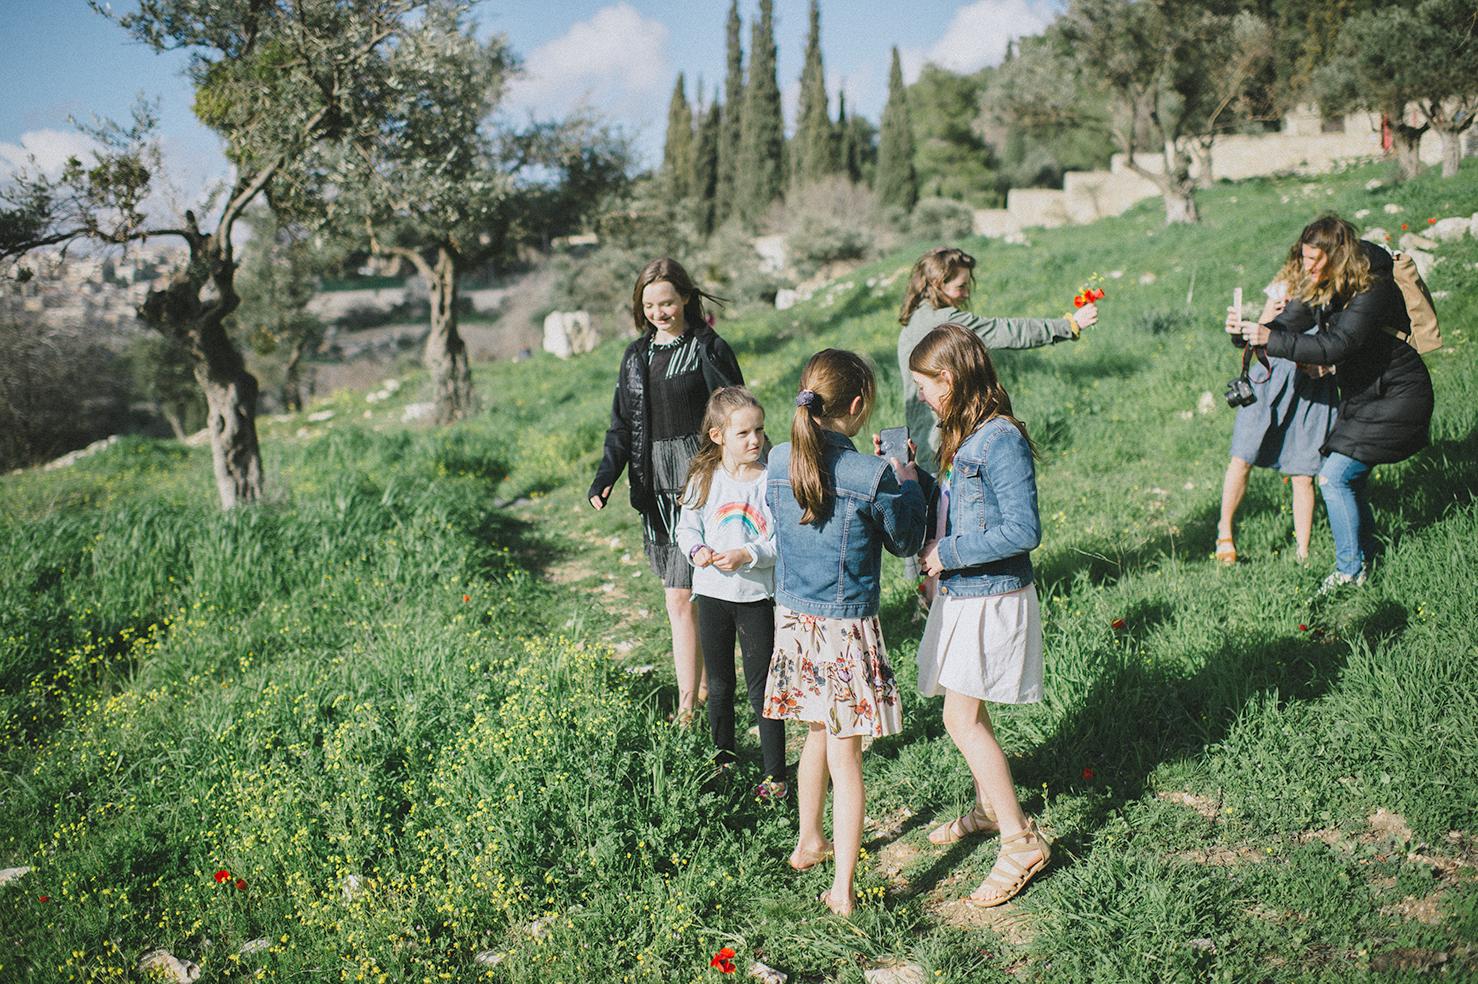 20190216_JERUSALEM-BREINHOLTS_282.jpg